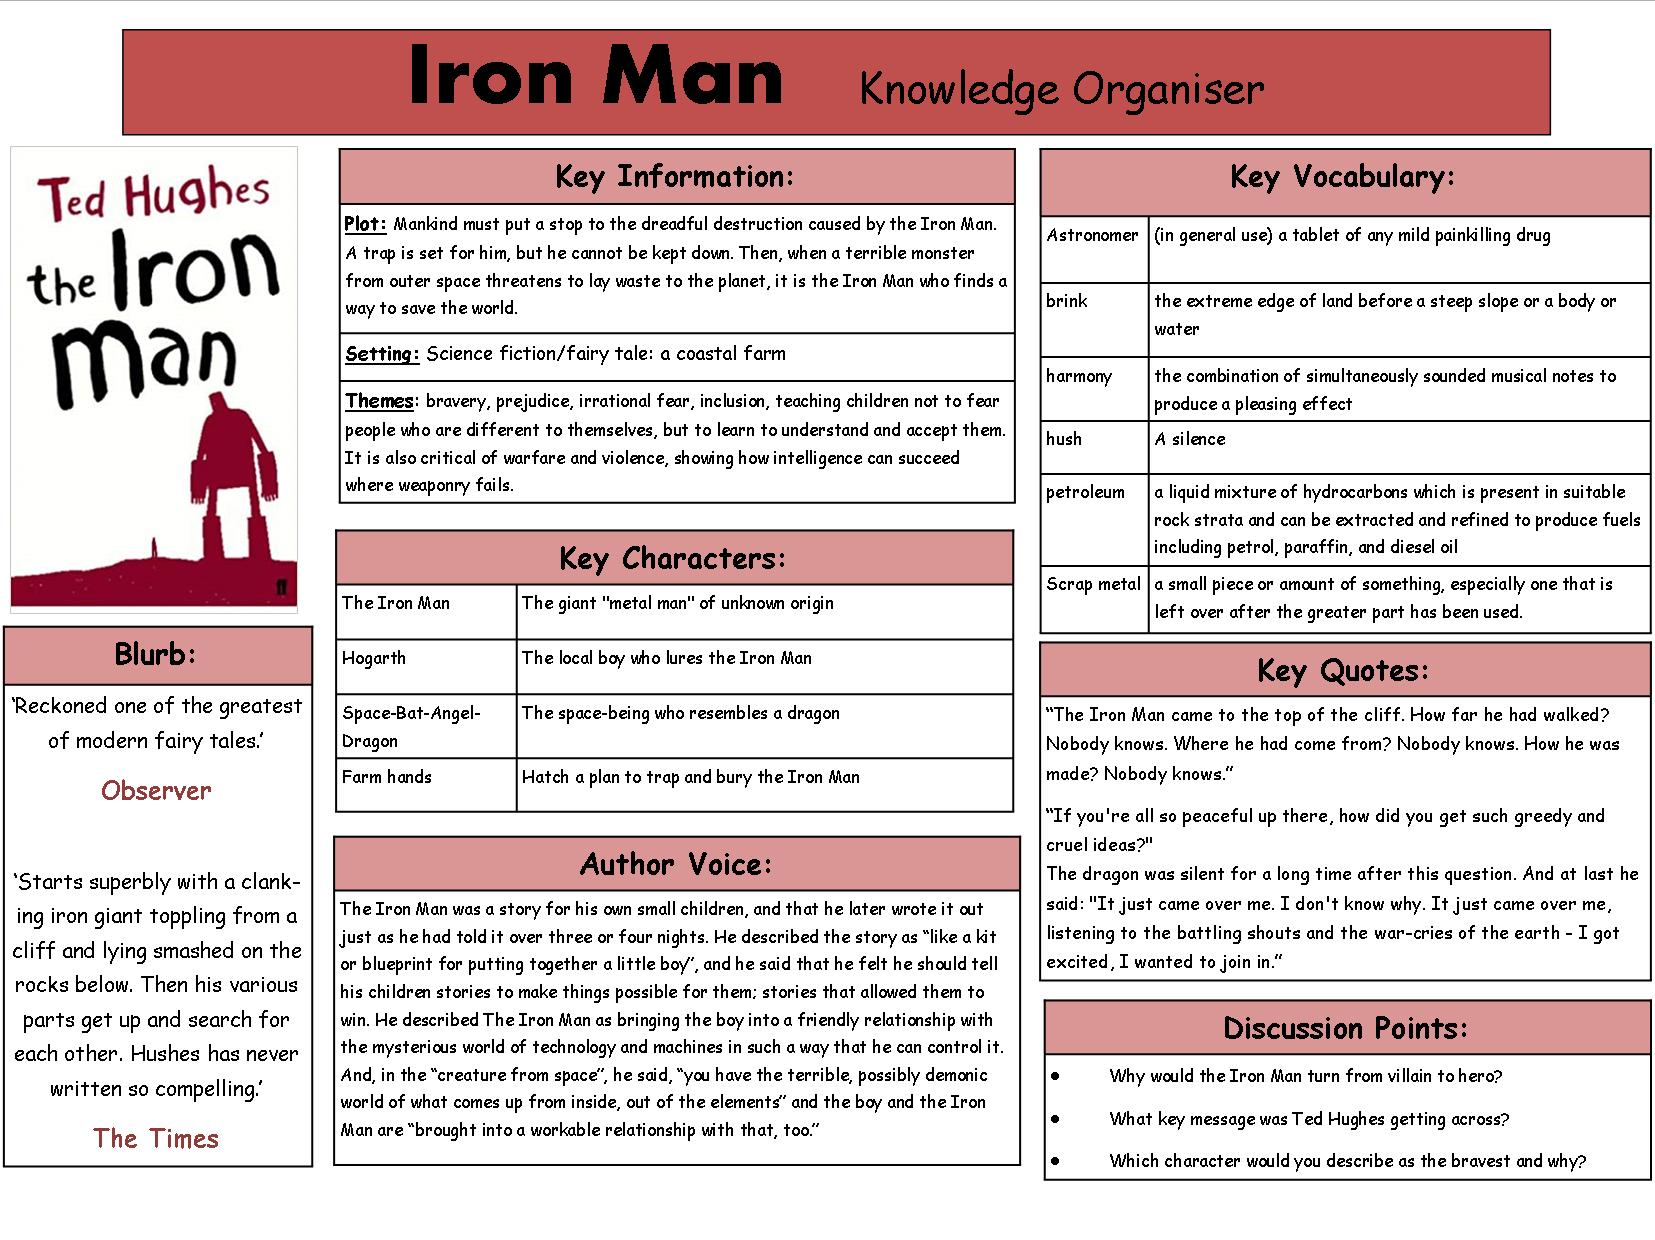 Iron Man Knowledge Organiser